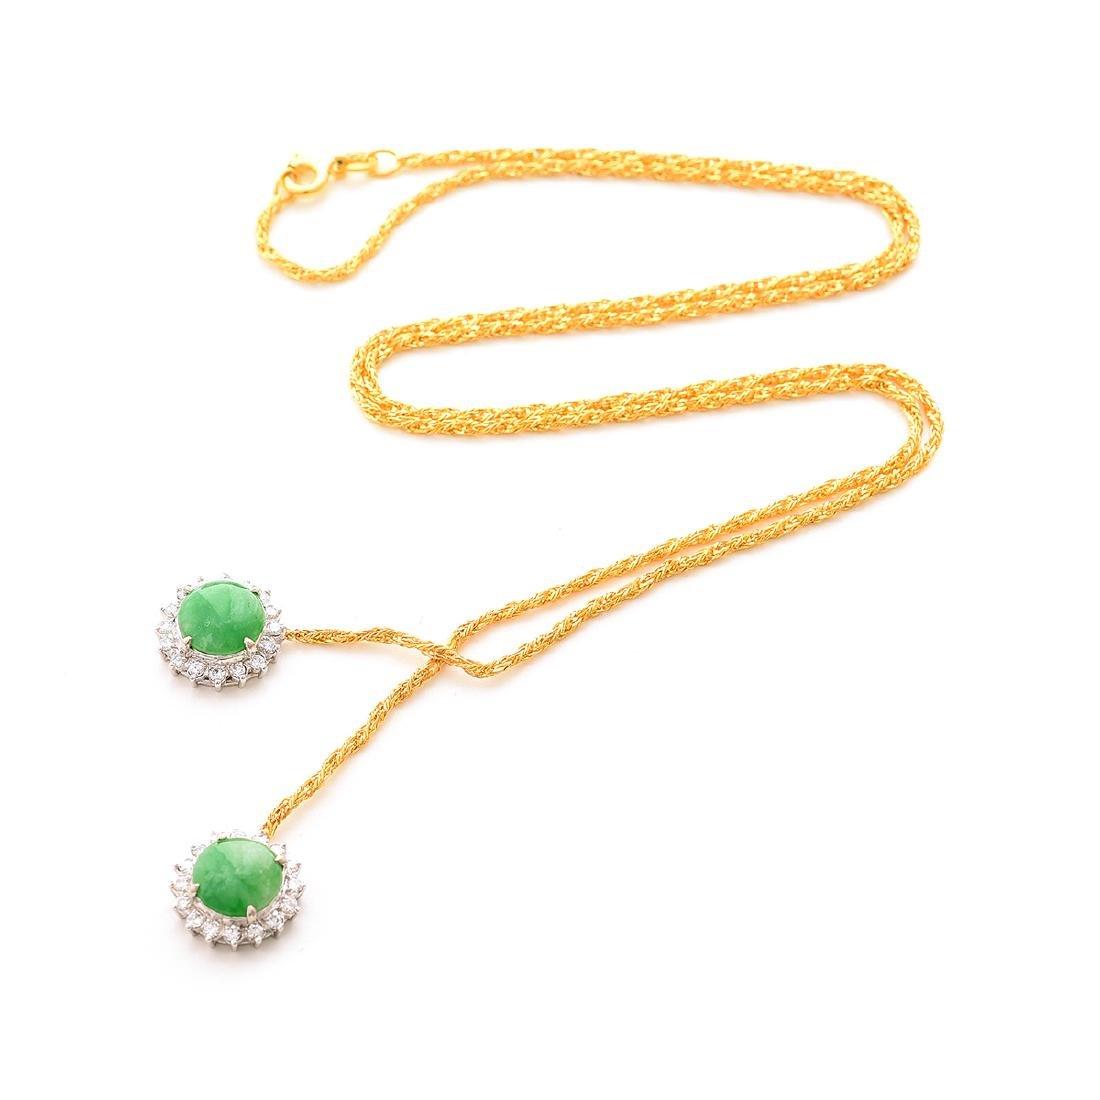 Jade, Diamond, 14k Gold Necklace.